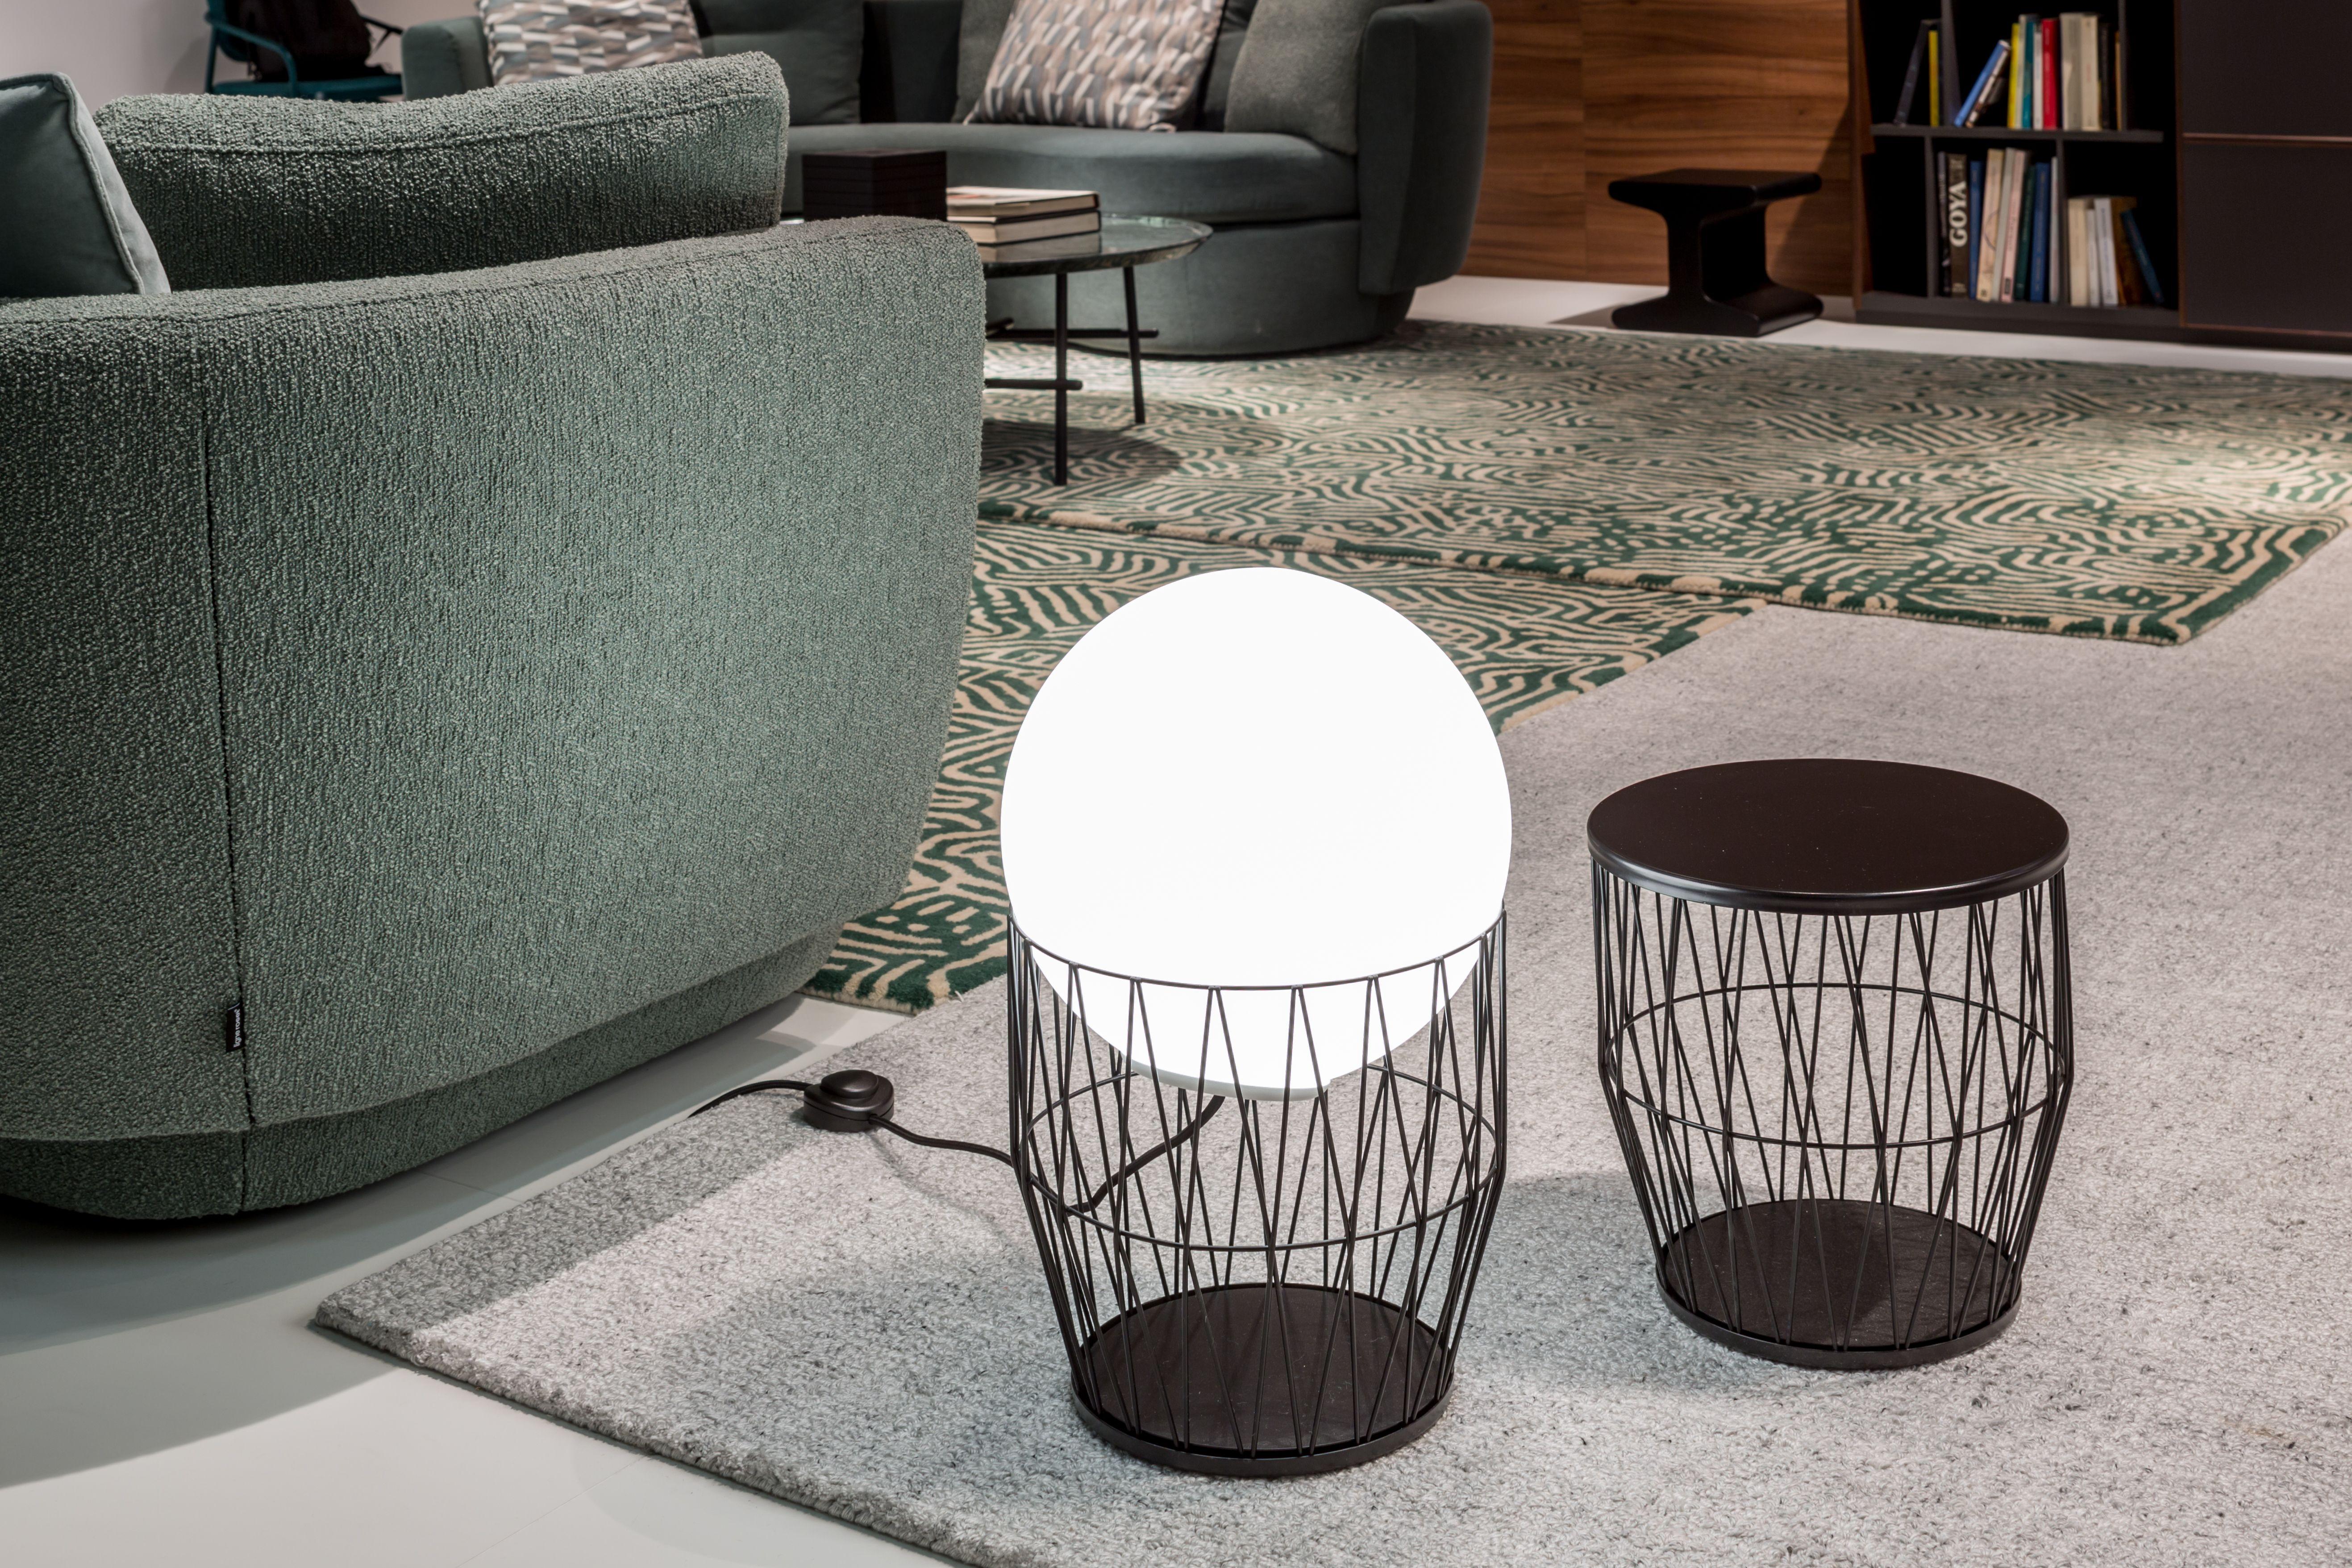 Design Salontafel Ligne Roset.Pin By Ligne Roset Uk On Imm Cologne 2019 With Images Table